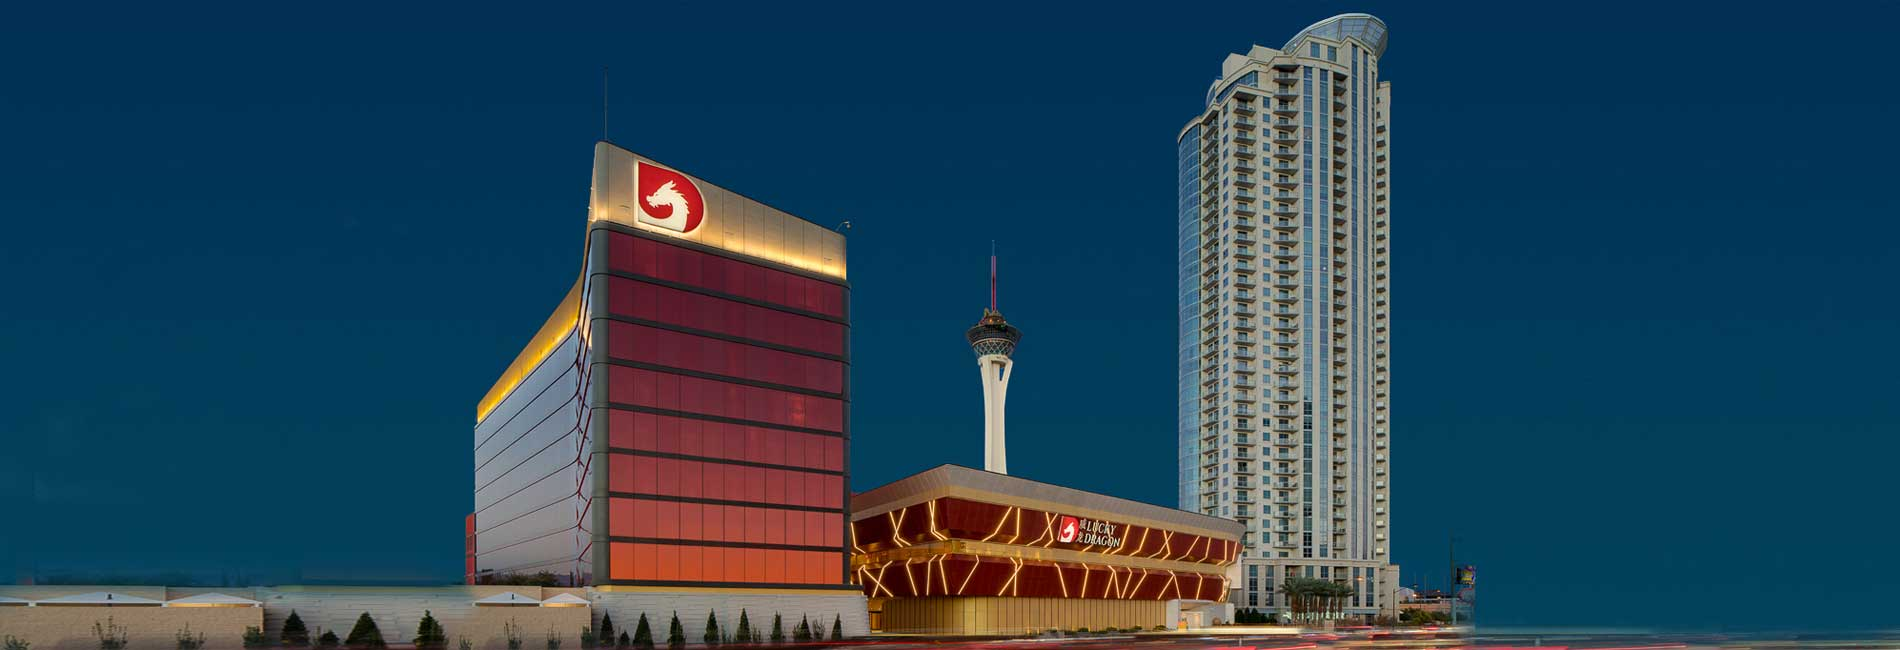 lucky dragon casino las vegas grand opening